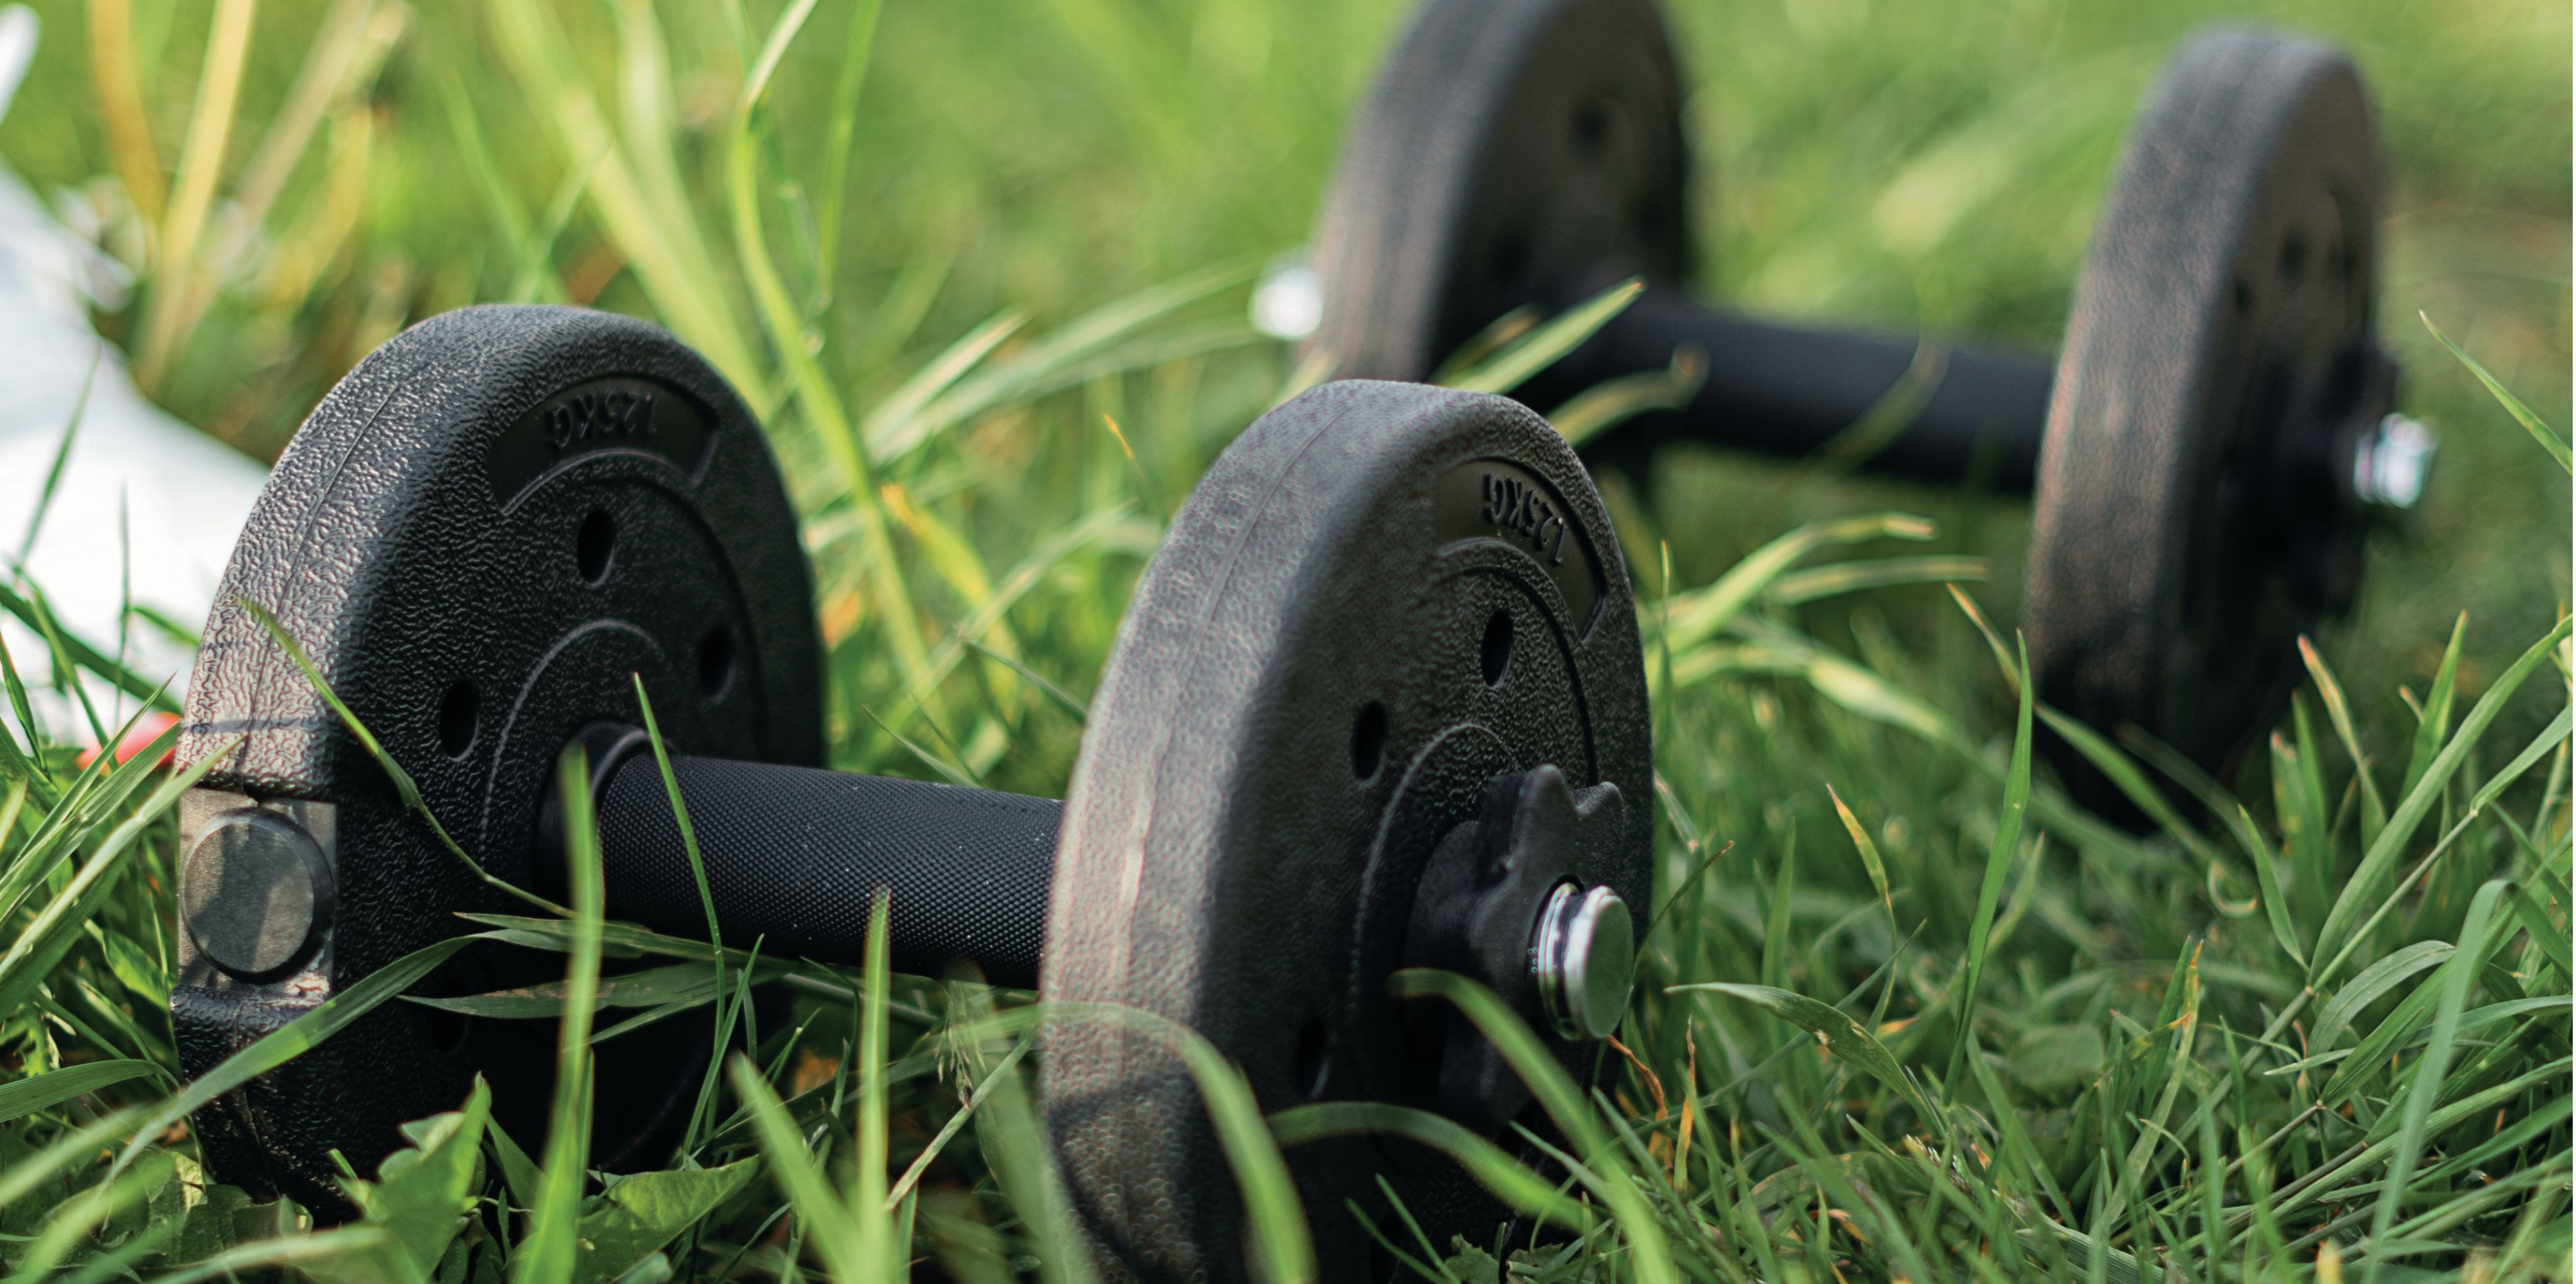 Hand weights sitting on the ground